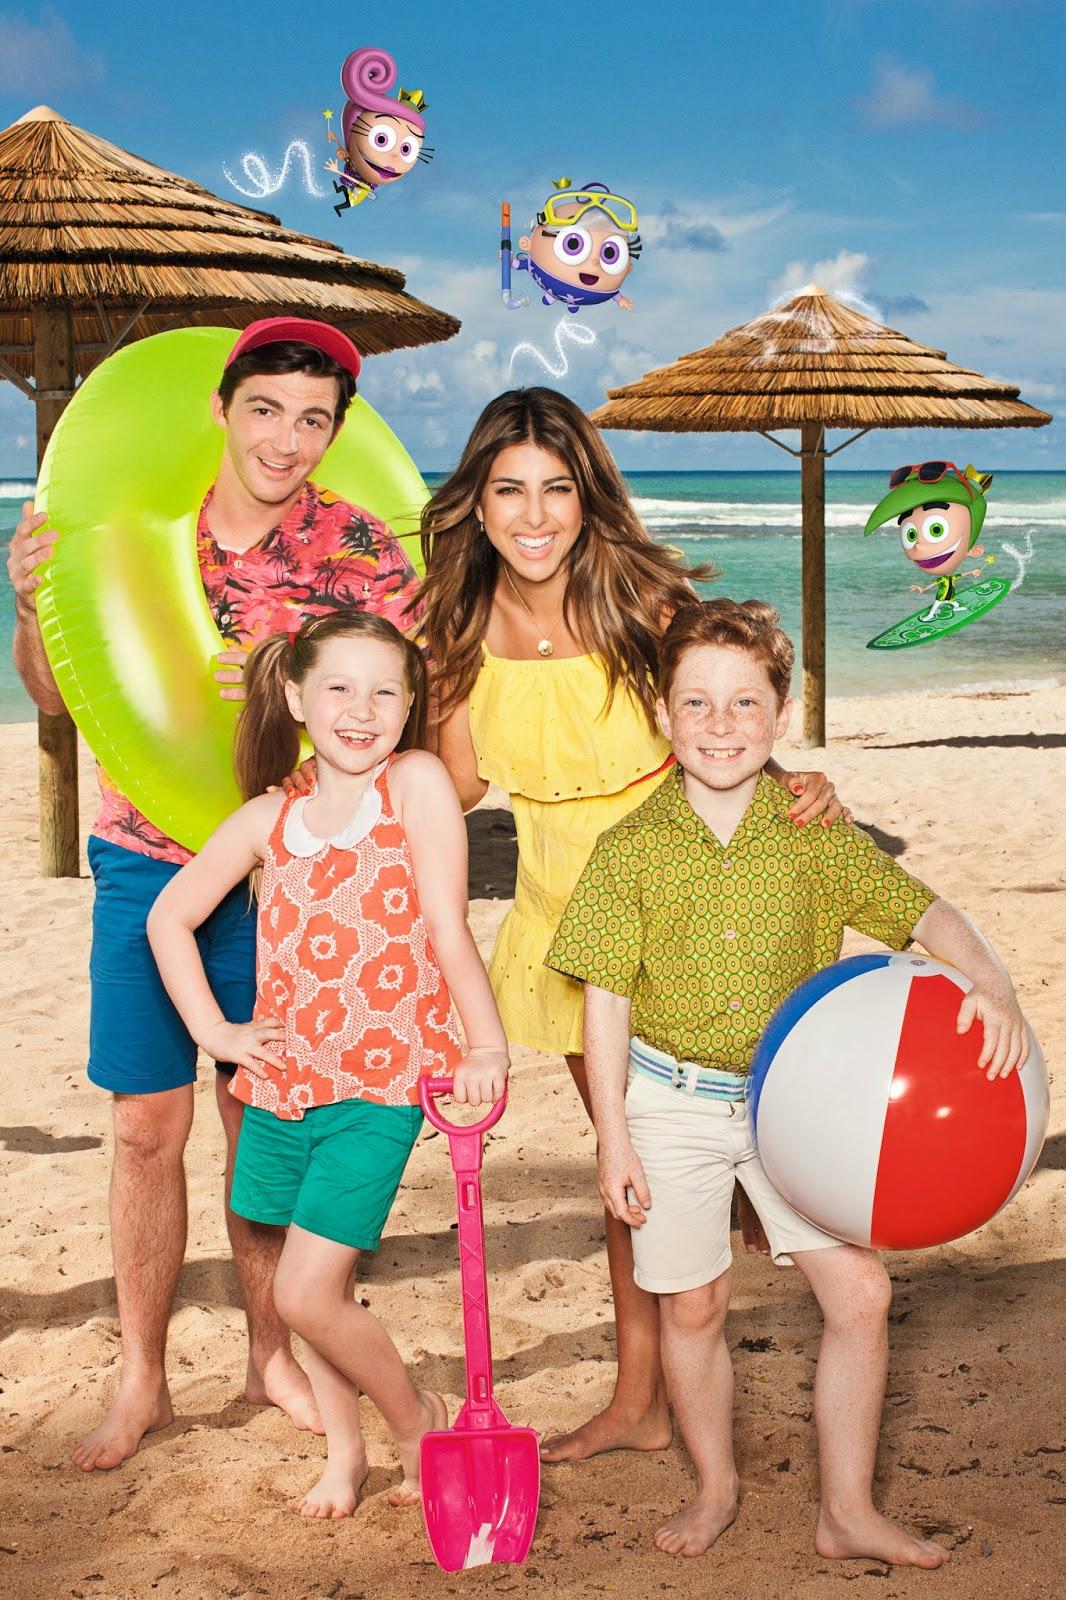 Fairly Odd Summer : fairly, summer, NickALive!:, Nickelodeon, Premiere, Movie, Fairly, Summer